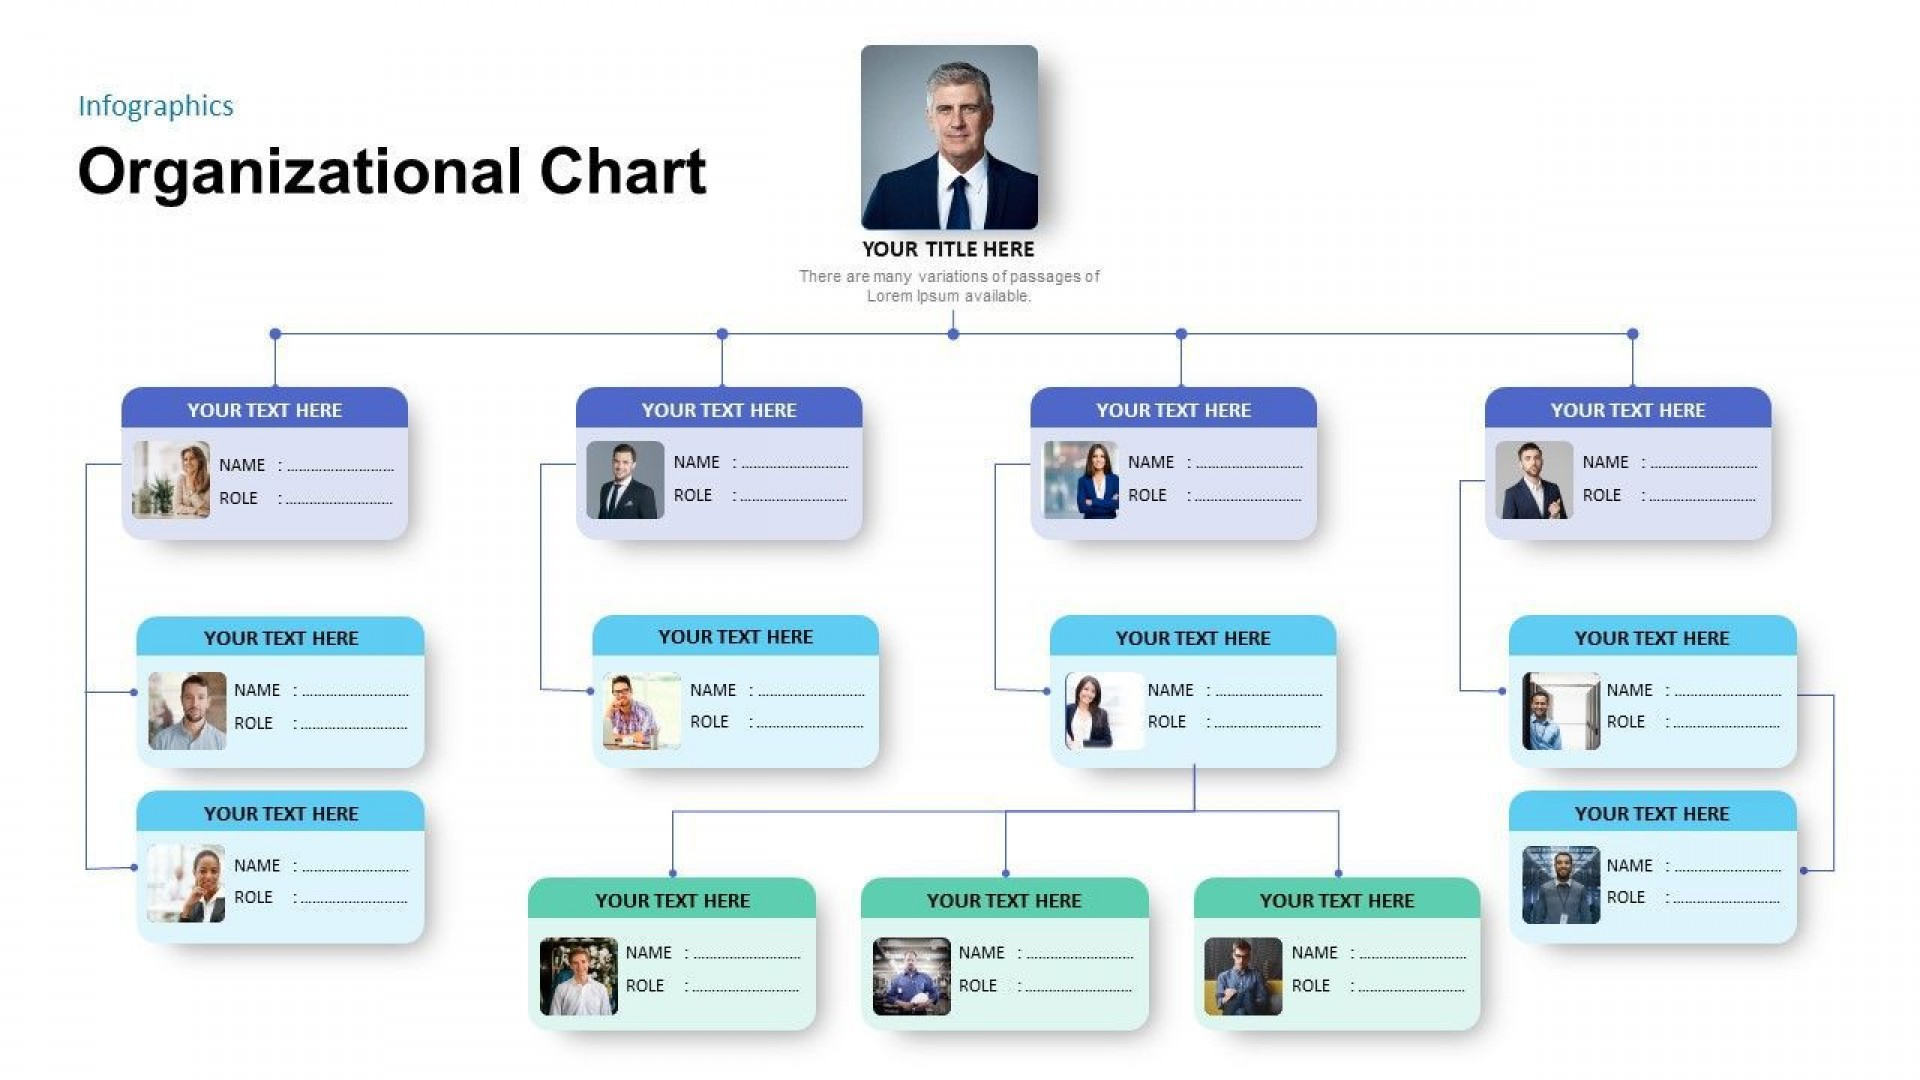 000 Fantastic Org Chart Template Powerpoint High Definition  Organization Free Download Organizational 2010 20131920